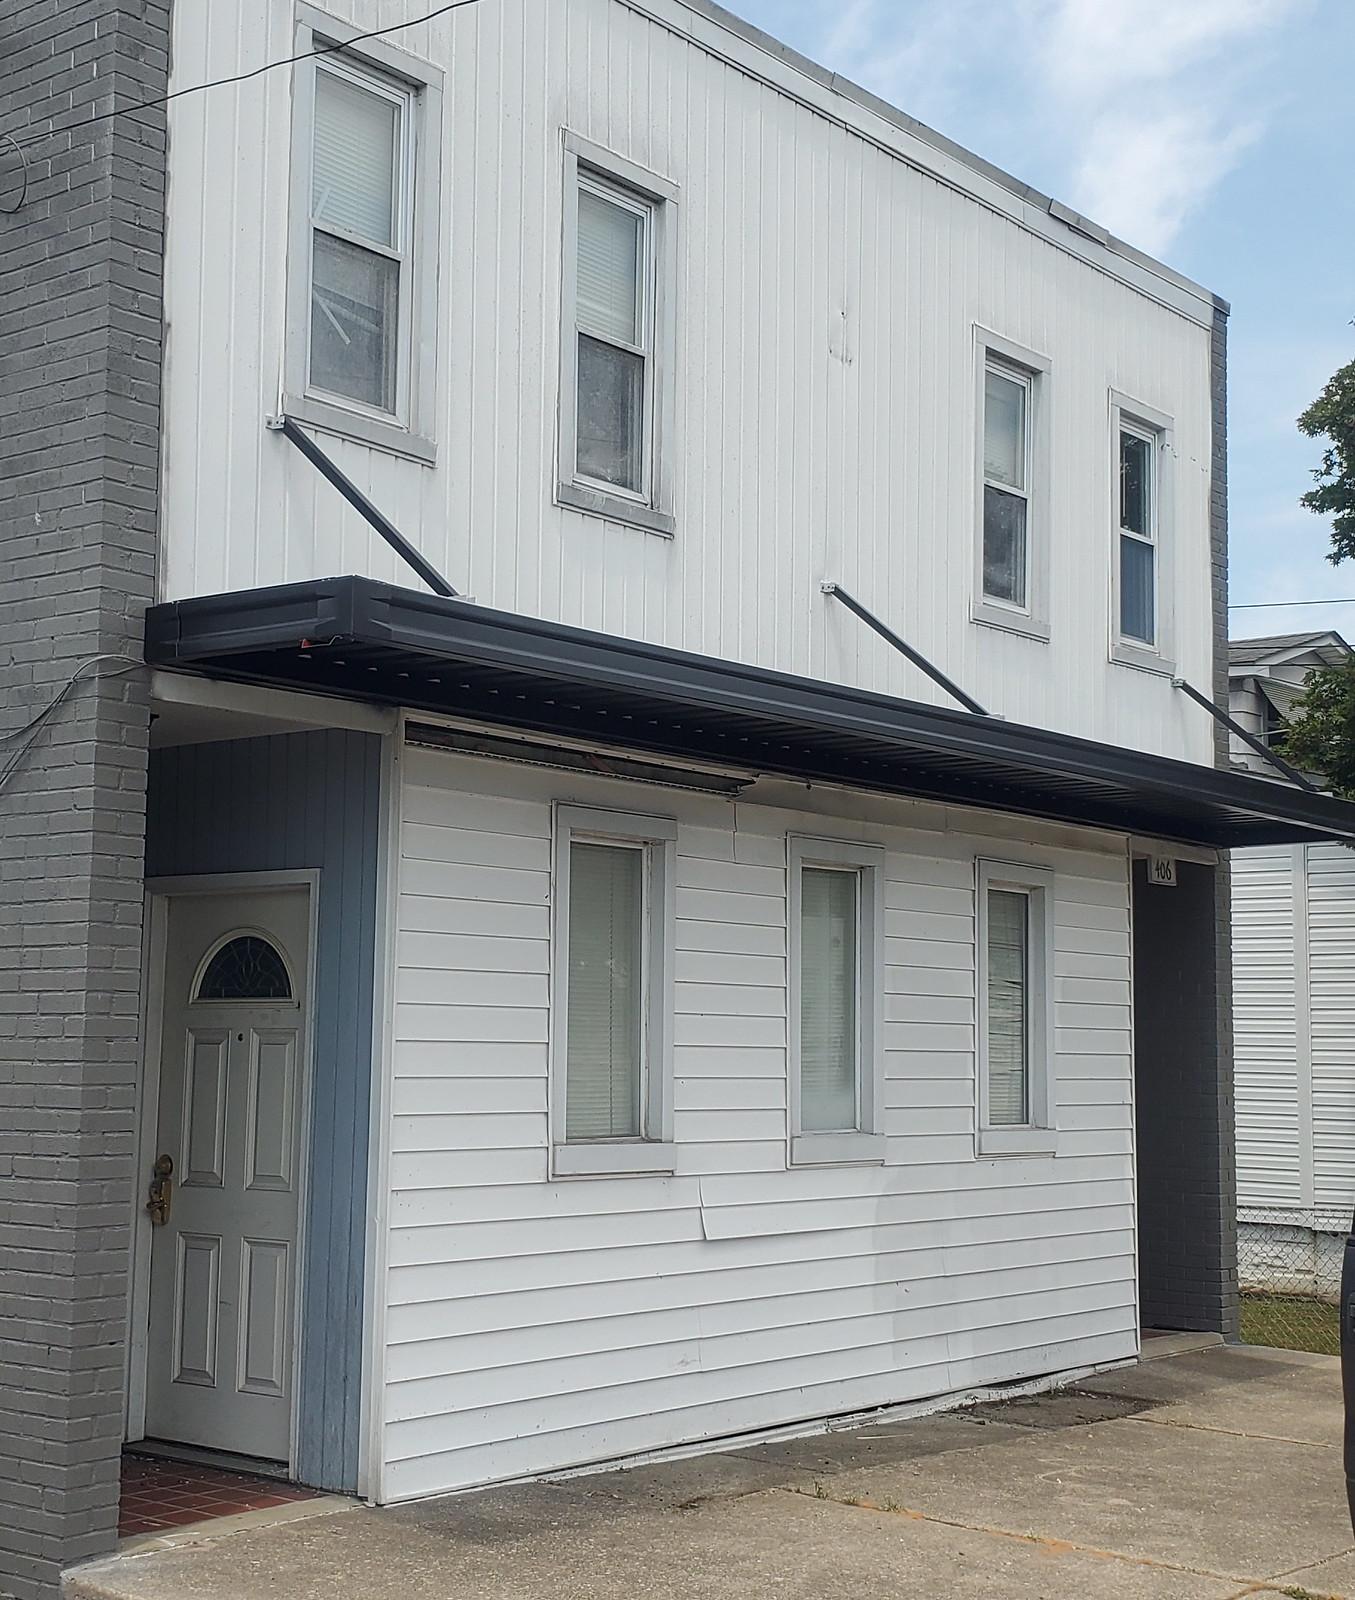 Flat Metal Awning for Building- Hoffman Awning Baltimore and DC